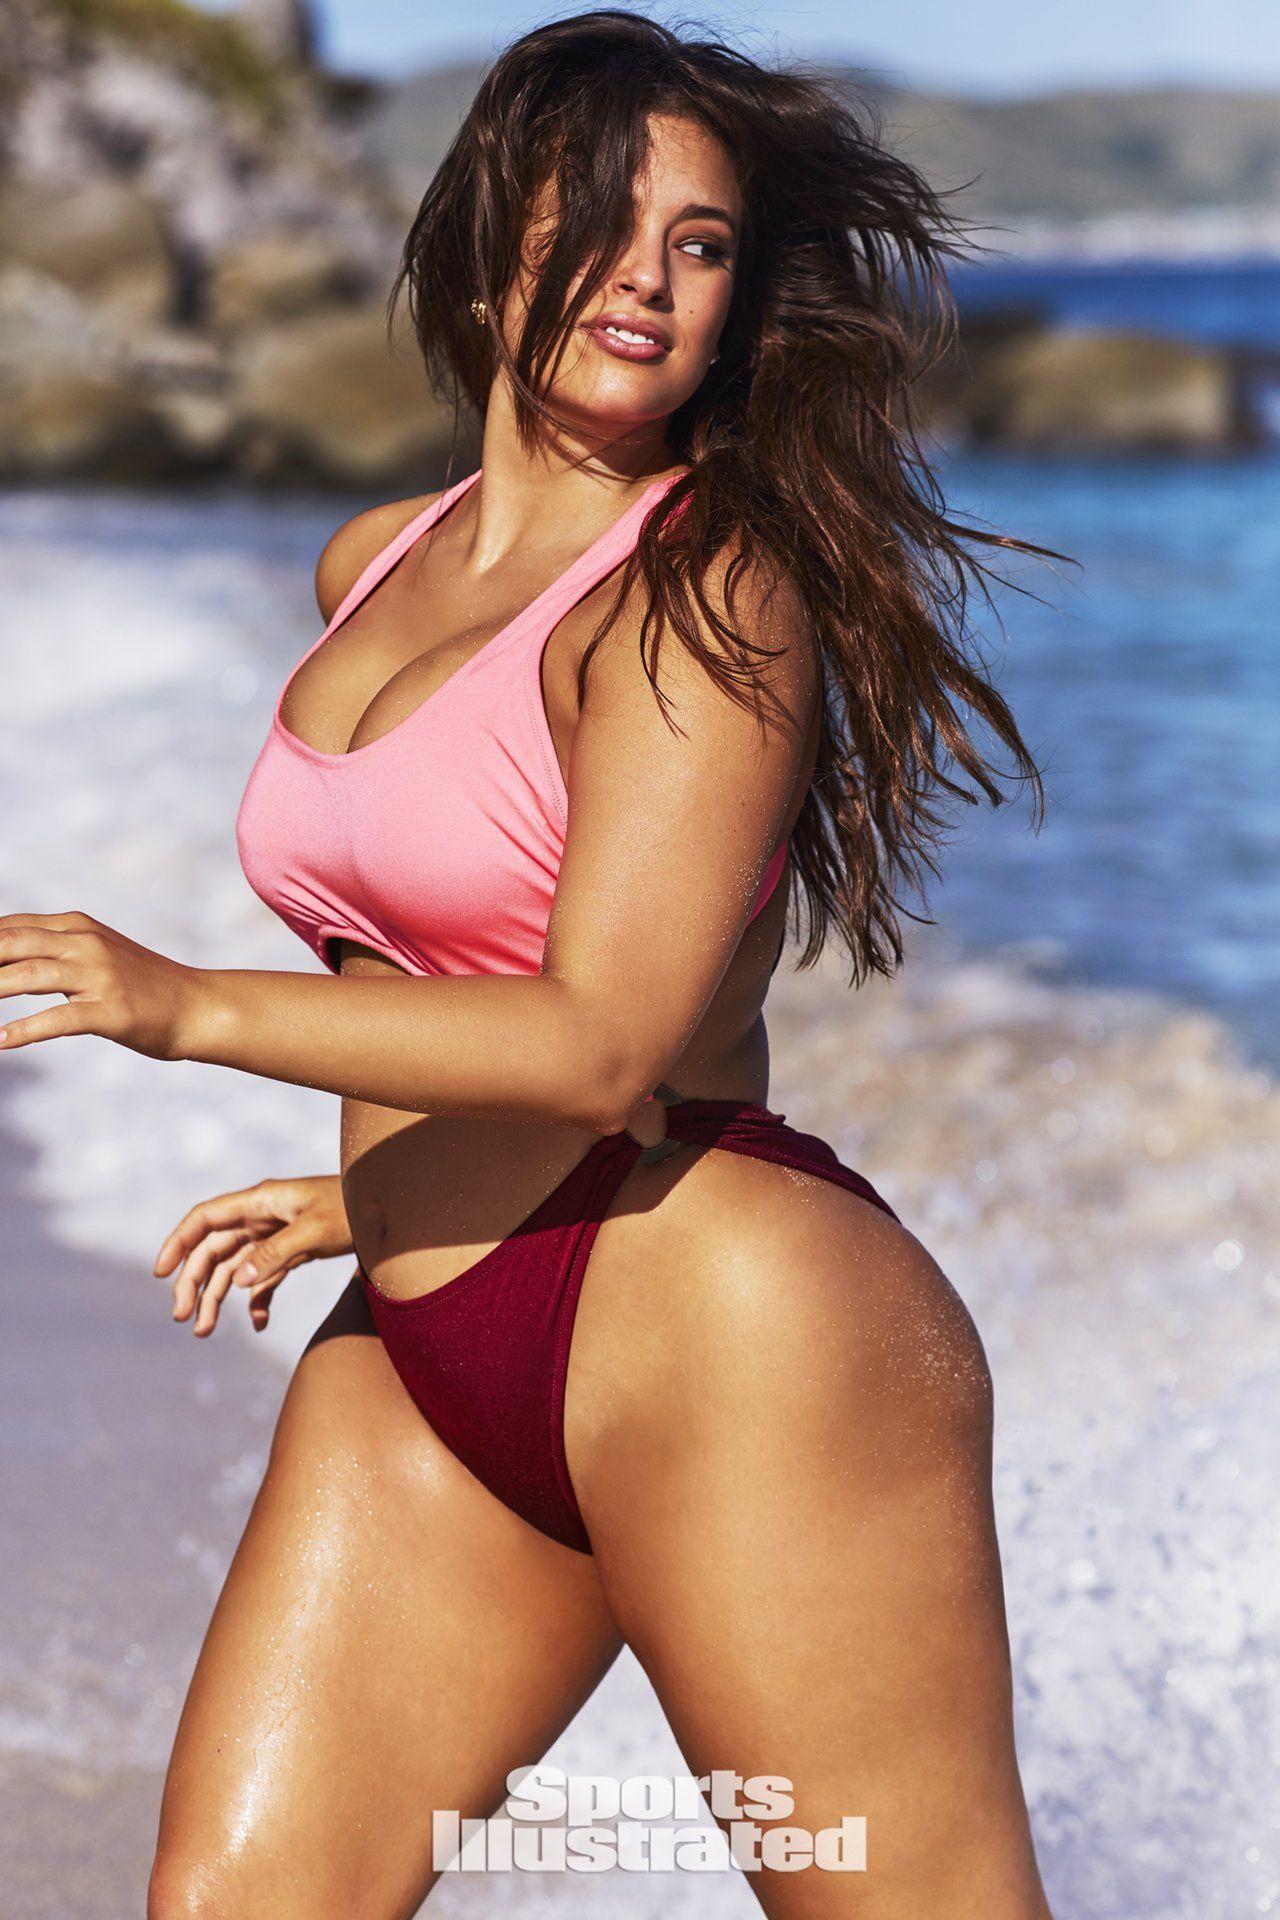 Bikini Sydney Graham nudes (64 photo), Pussy, Bikini, Boobs, cleavage 2017